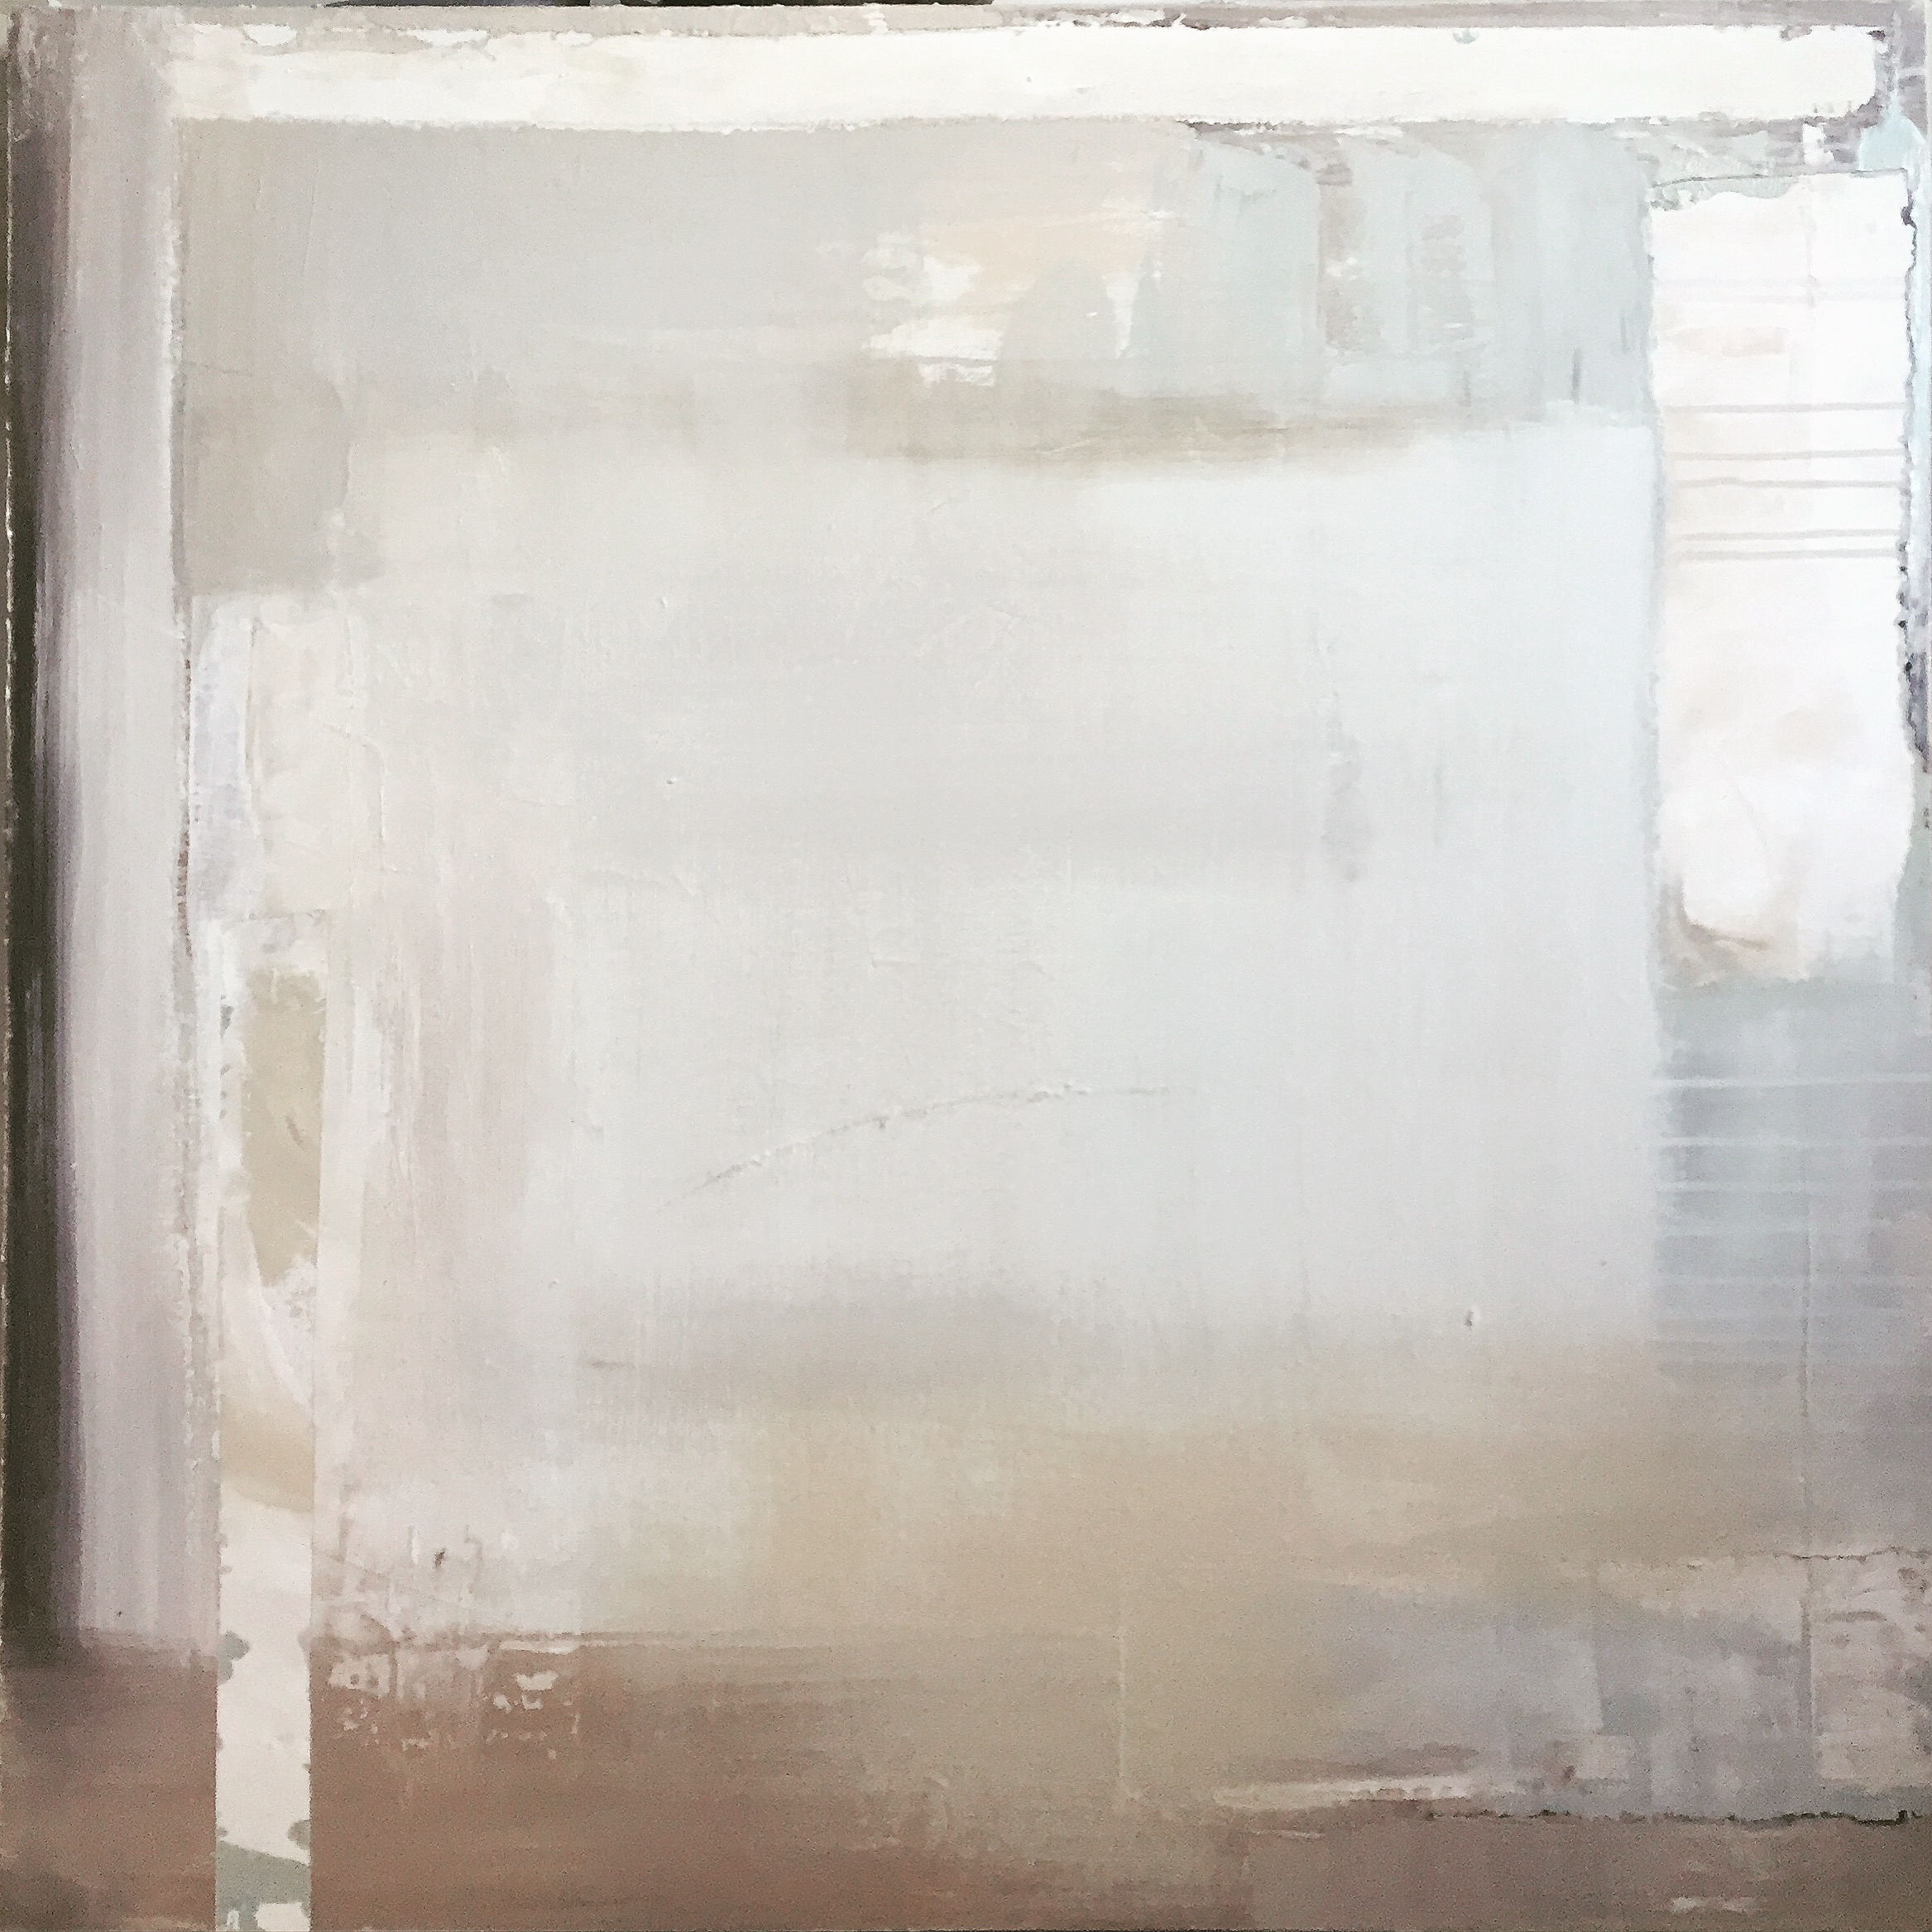 36 x 36 mixed media on canvas